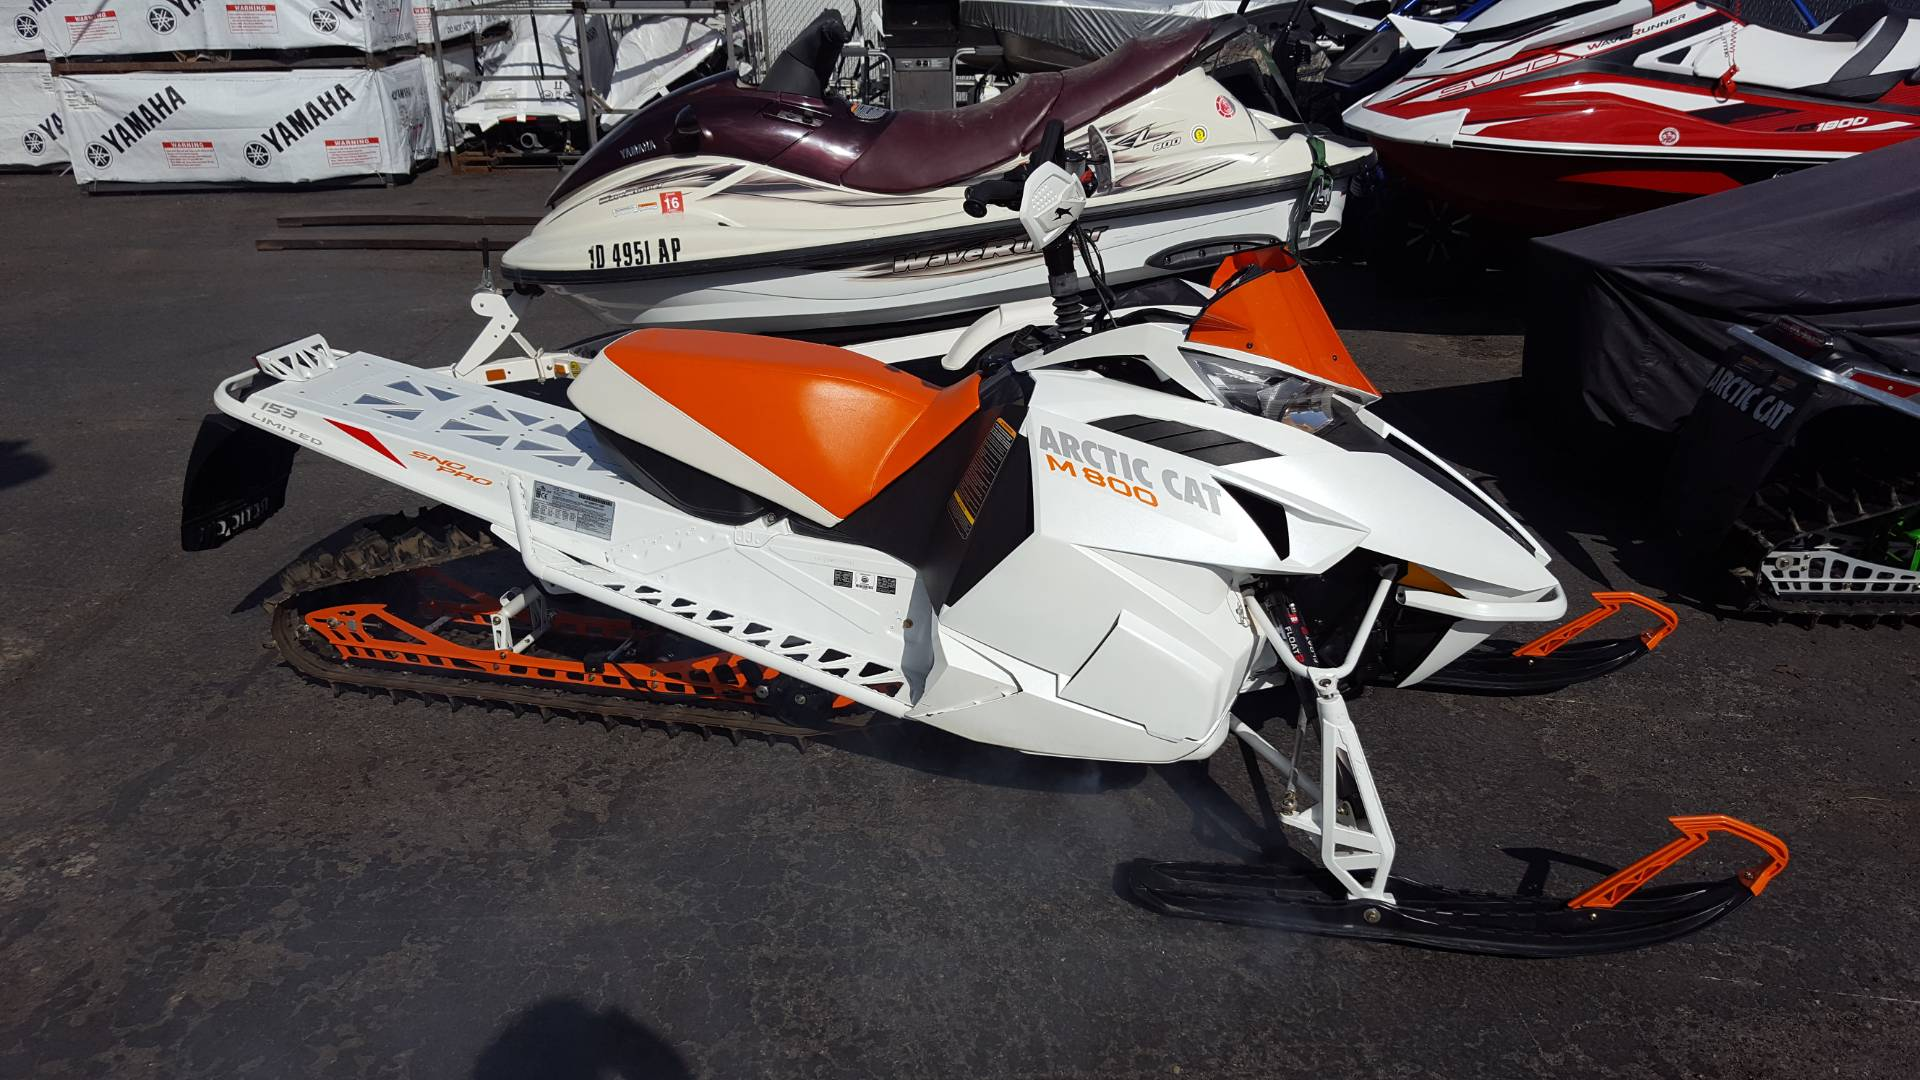 "2012 M 800 Sno Pro 153"" Limited"